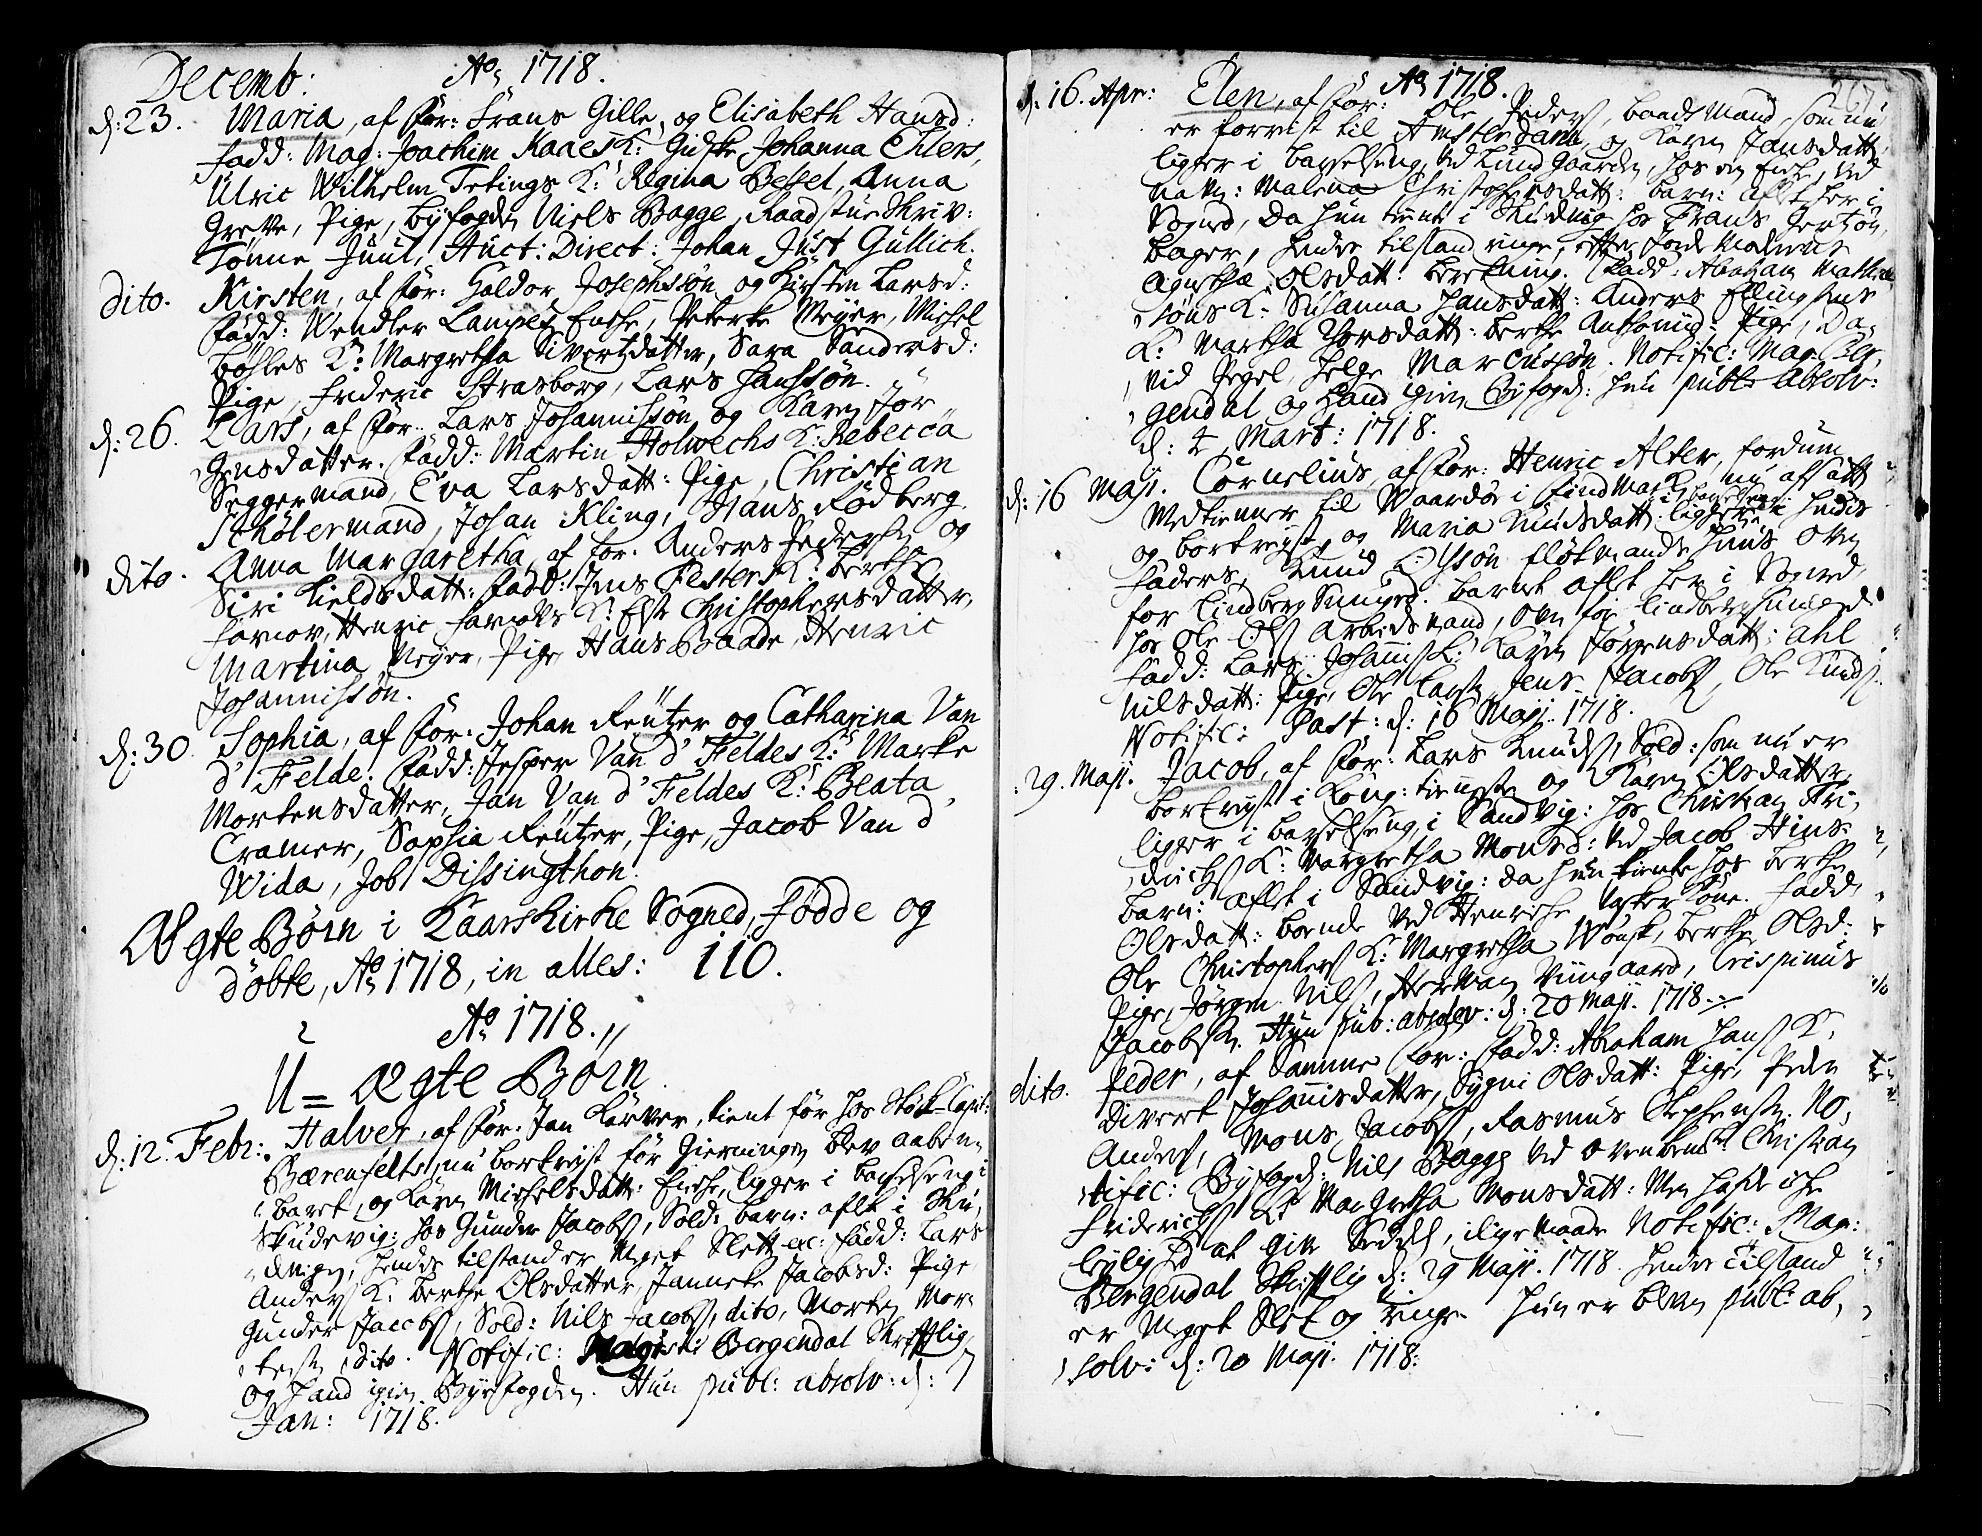 SAB, Korskirken Sokneprestembete, H/Haa/L0003: Ministerialbok nr. A 3, 1698-1719, s. 267